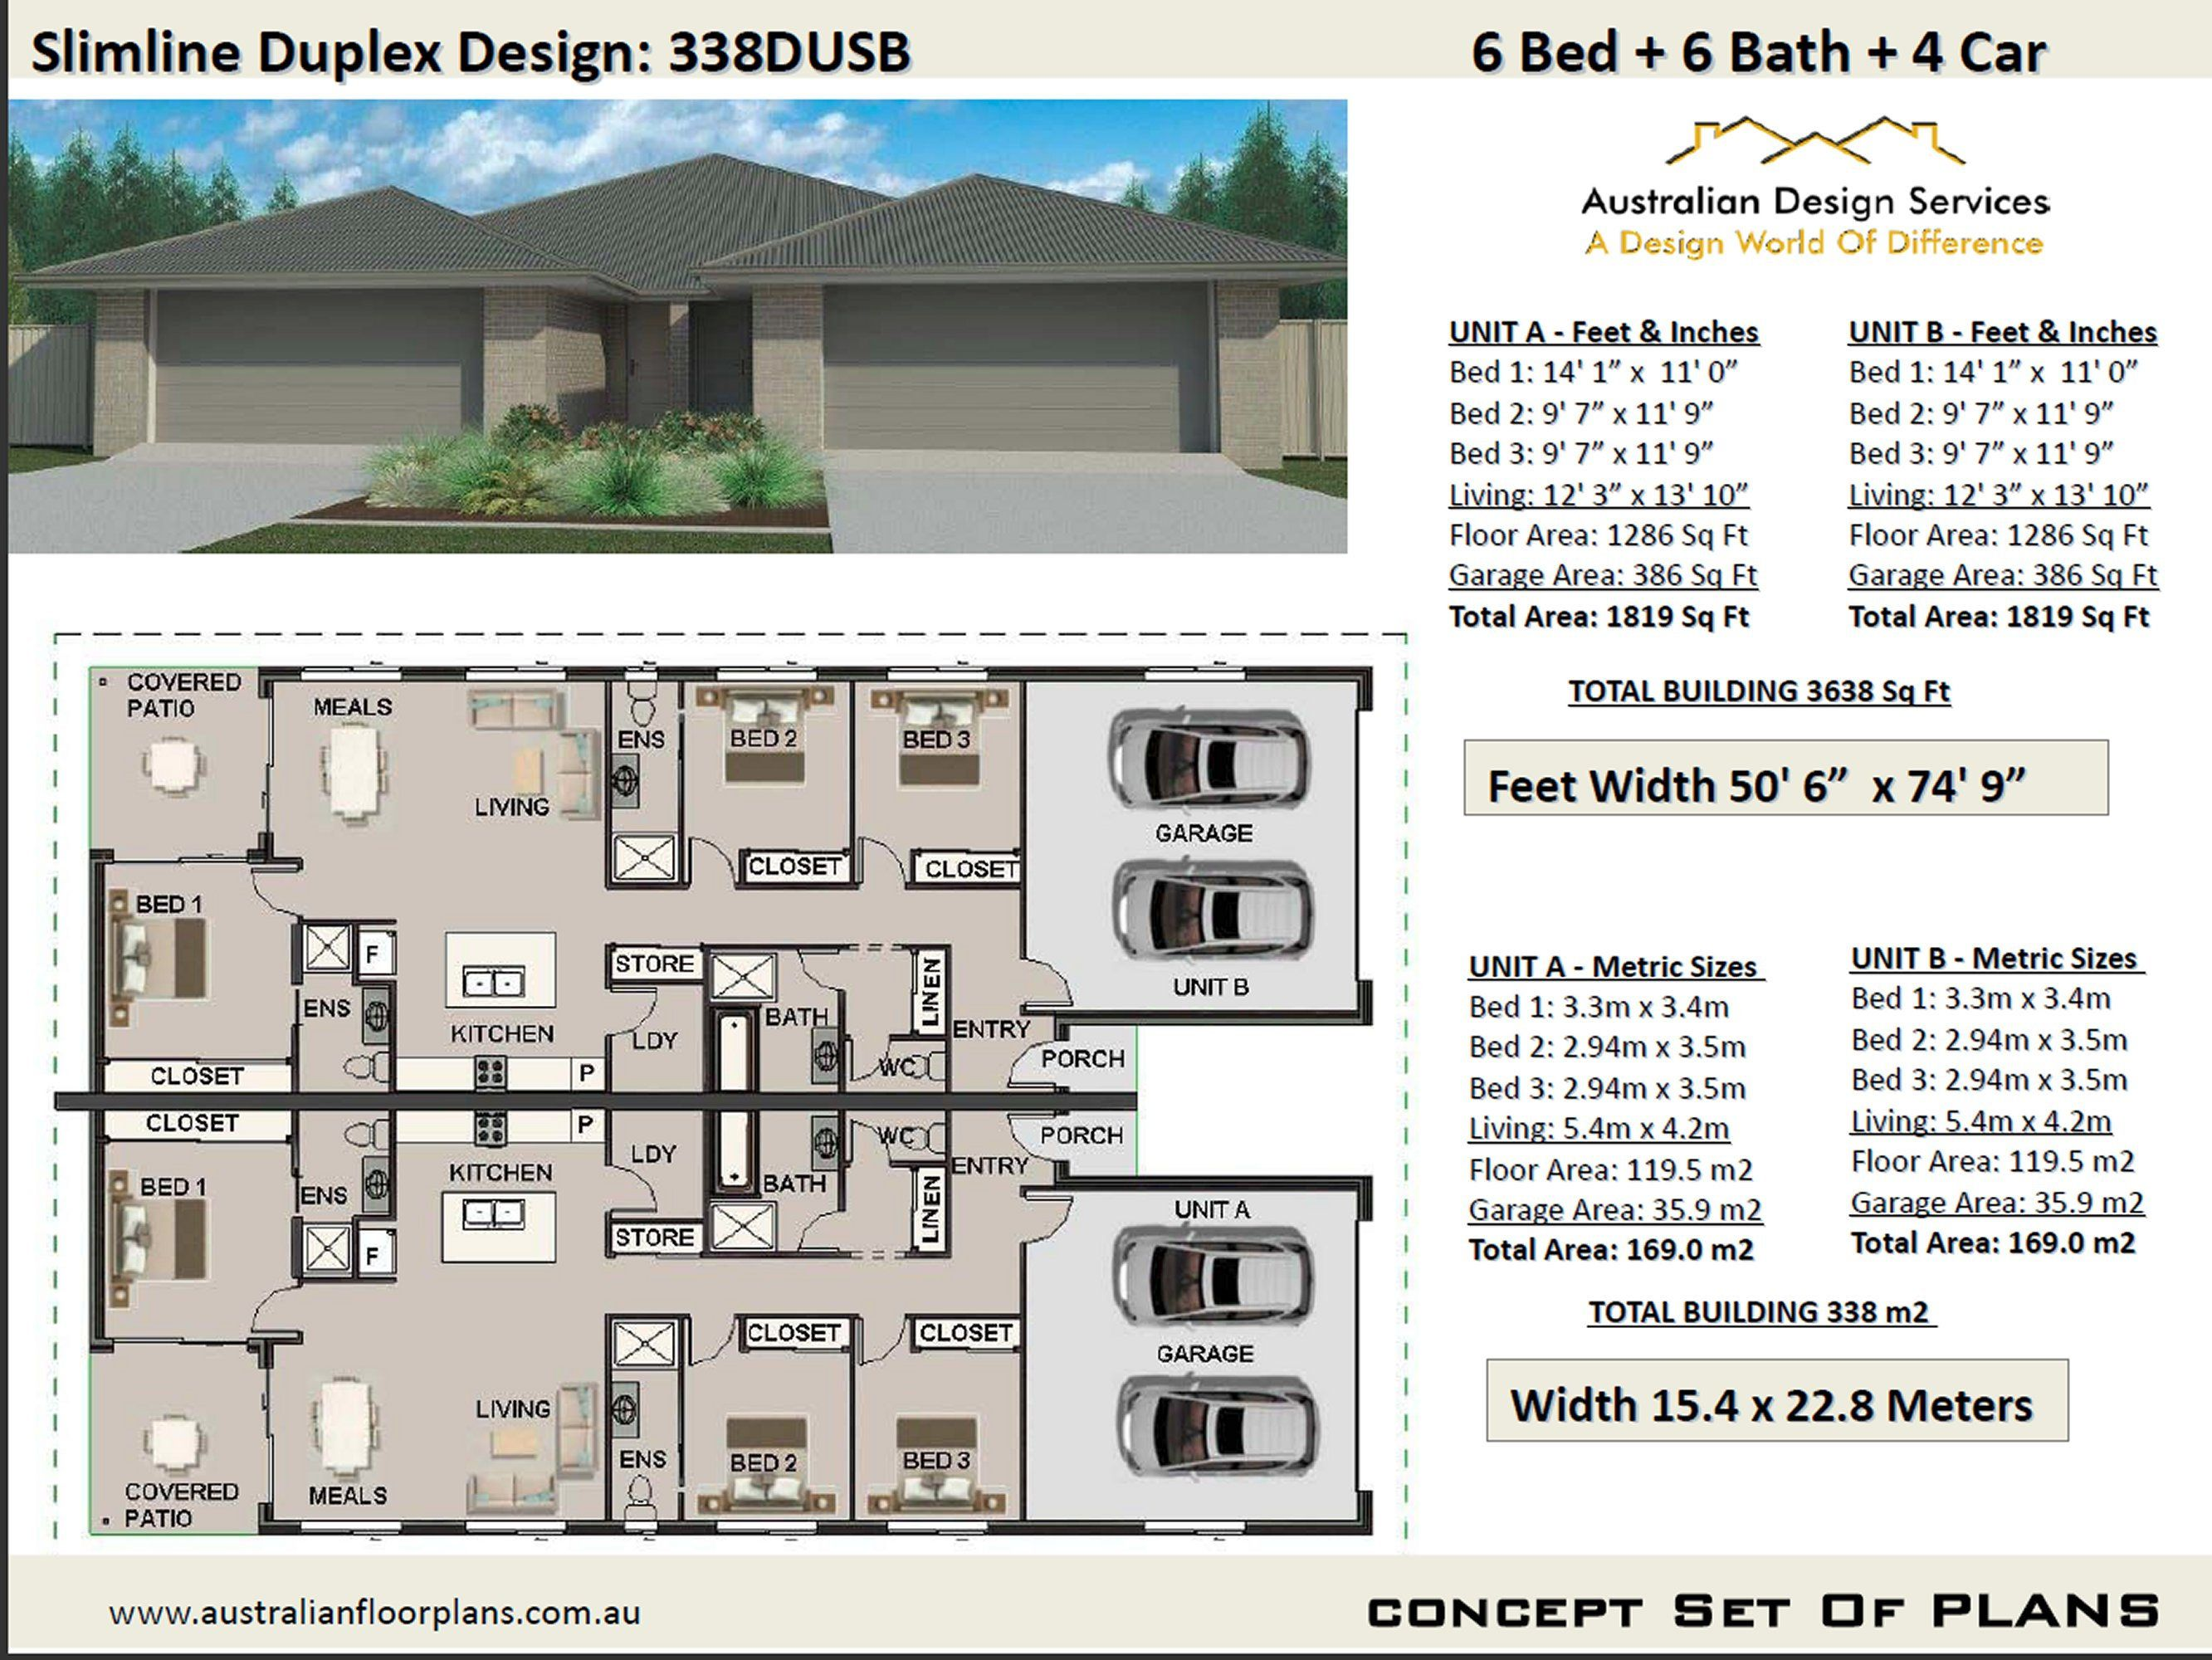 Slimline Narrow Duplex Design 6 Bed 6 Bath Duplex House Etsy In 2021 Duplex Design House Plans Australia House Plans For Sale